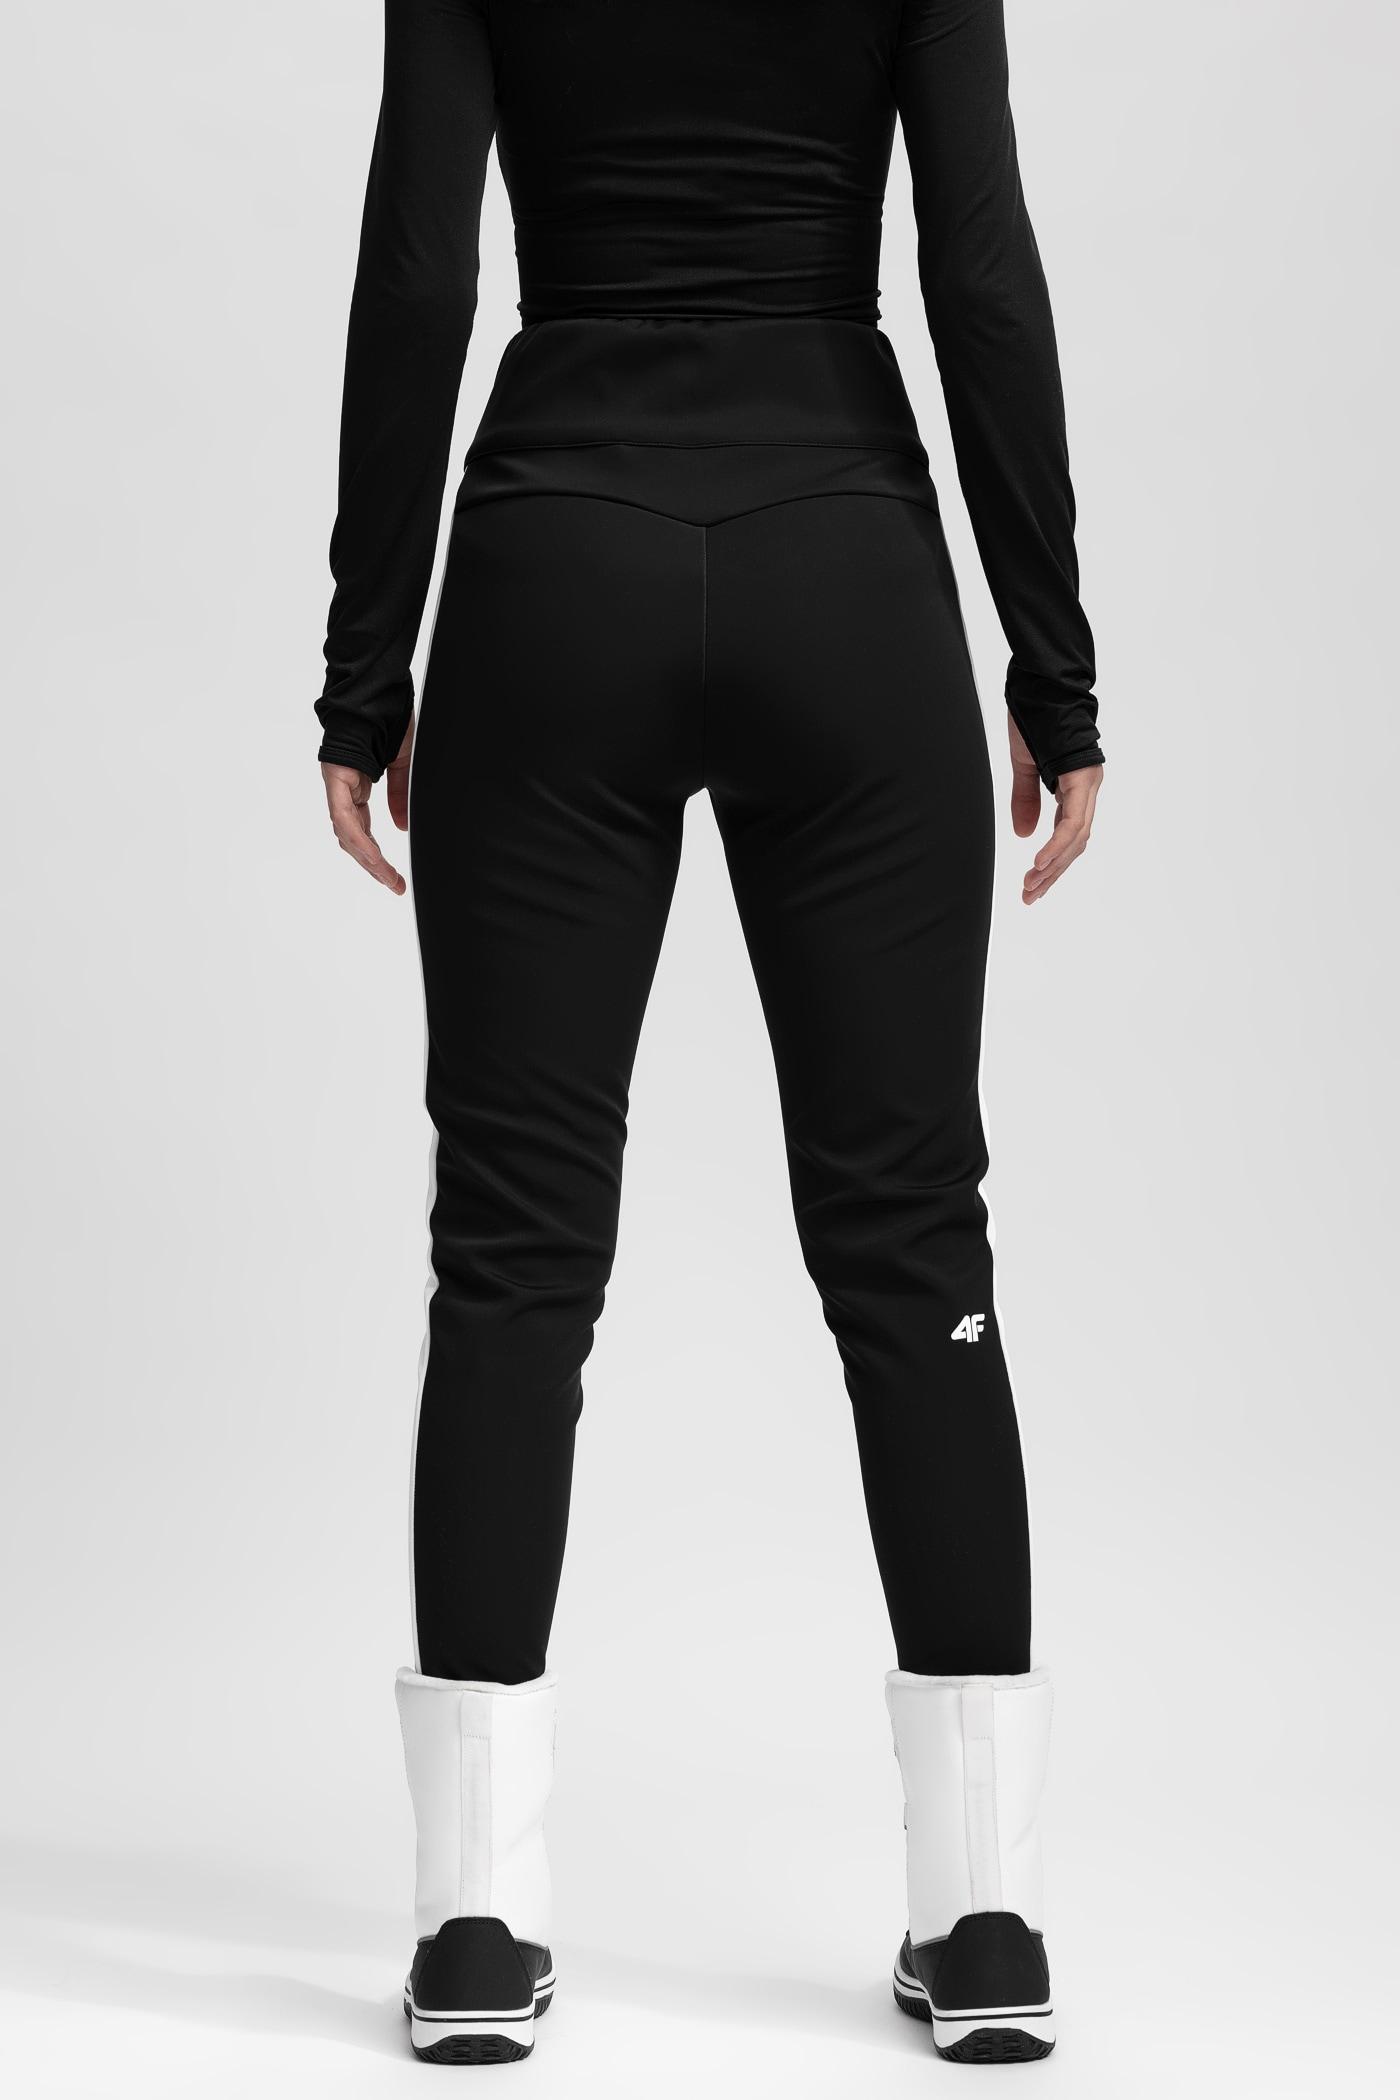 9c4d3ffeb8e5 Dámske lyžiarske nohavice SPDN101 - čierna